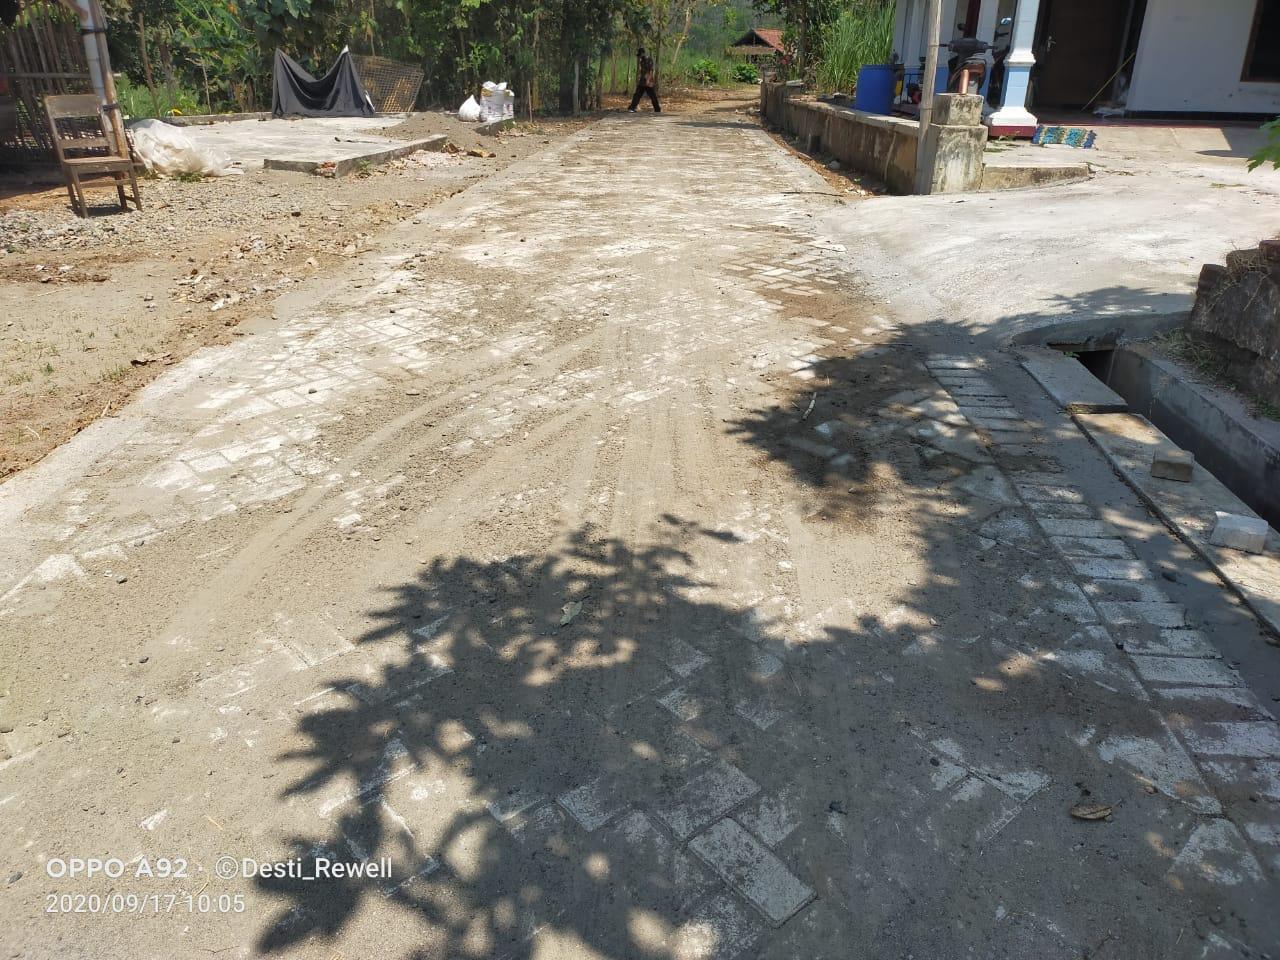 Lewat Teknik Paving Block, Jalan Desa Kates Tulungagung Semakin Rapi - 60dtk.com